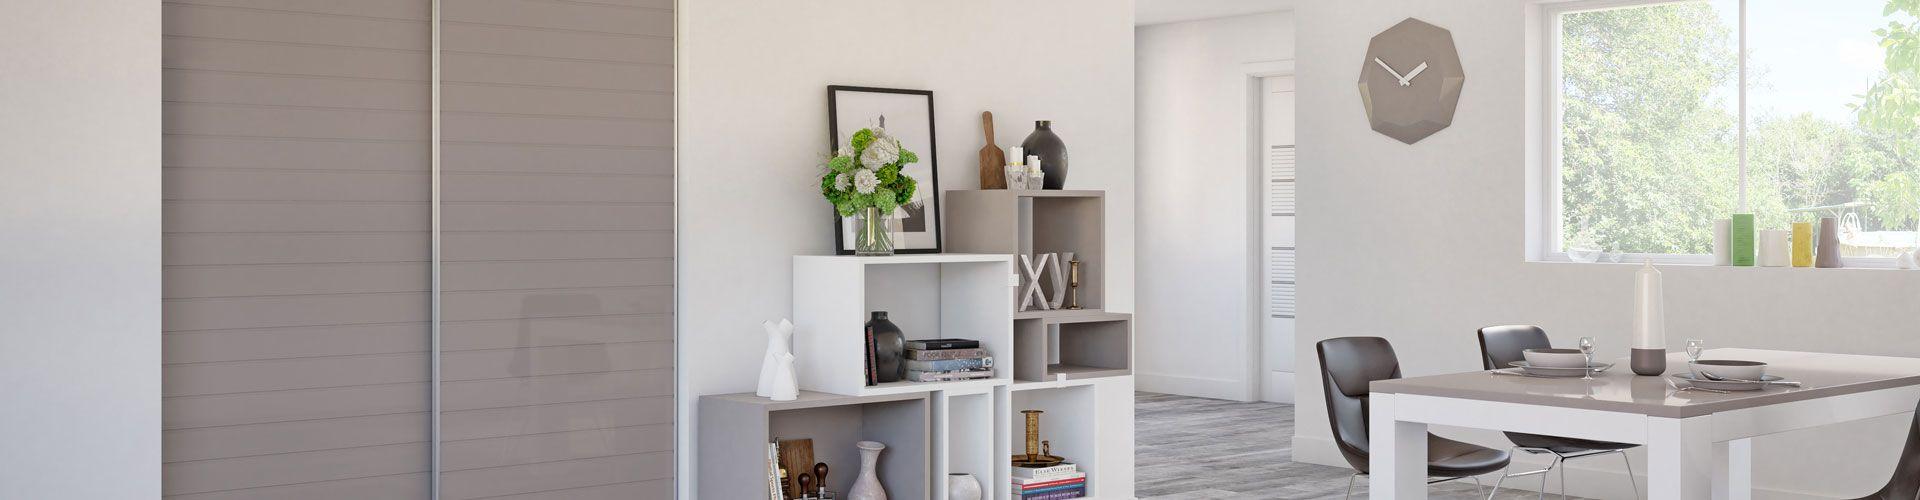 portes de placard verre laqu rainur naturel kazed. Black Bedroom Furniture Sets. Home Design Ideas